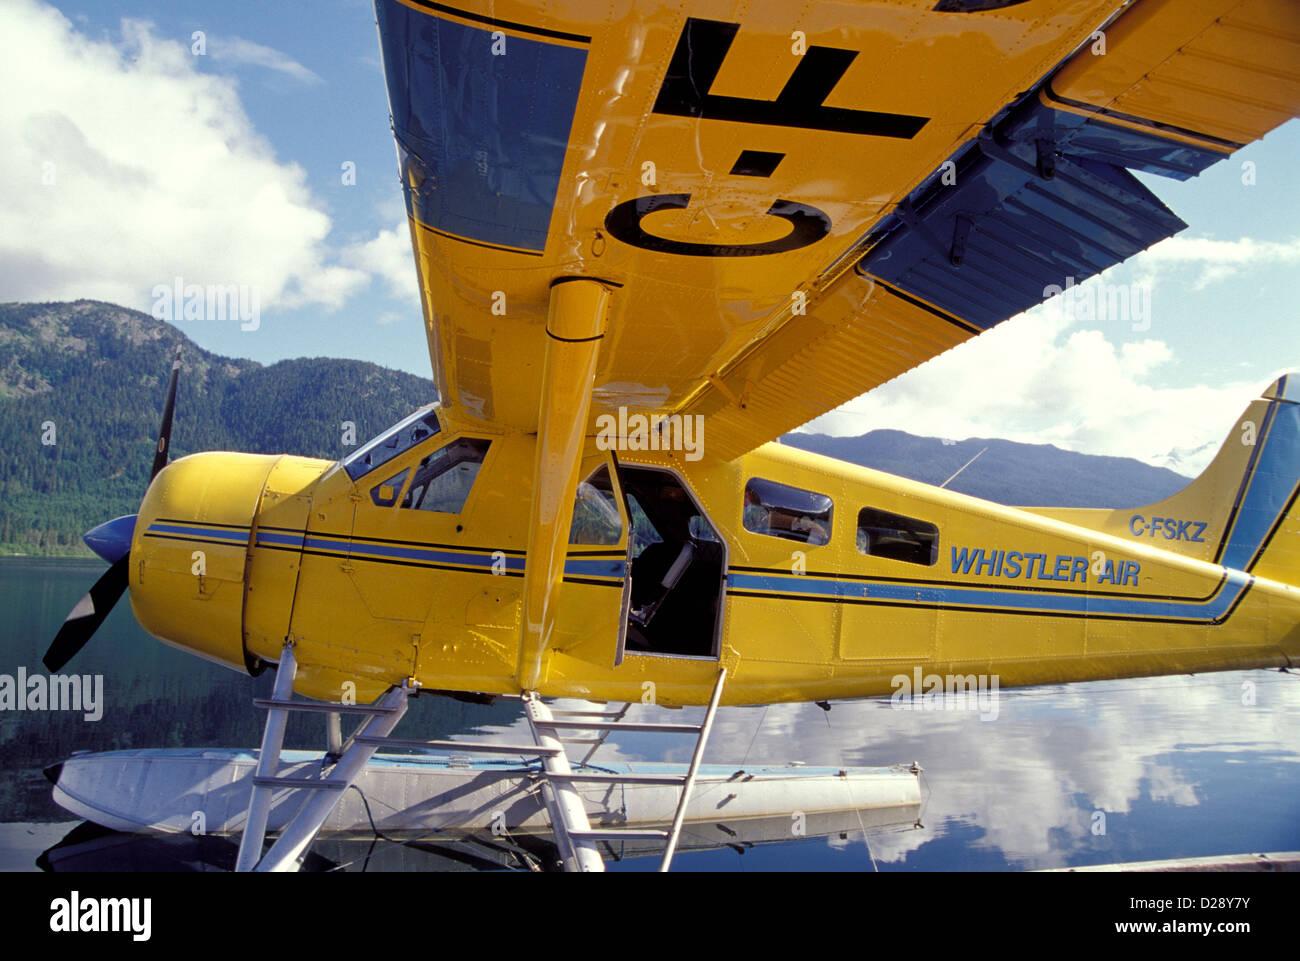 Le Canada, de la Colombie-Britannique, Whistler River Adventures. Hydravion, Green Lake. Photo Stock